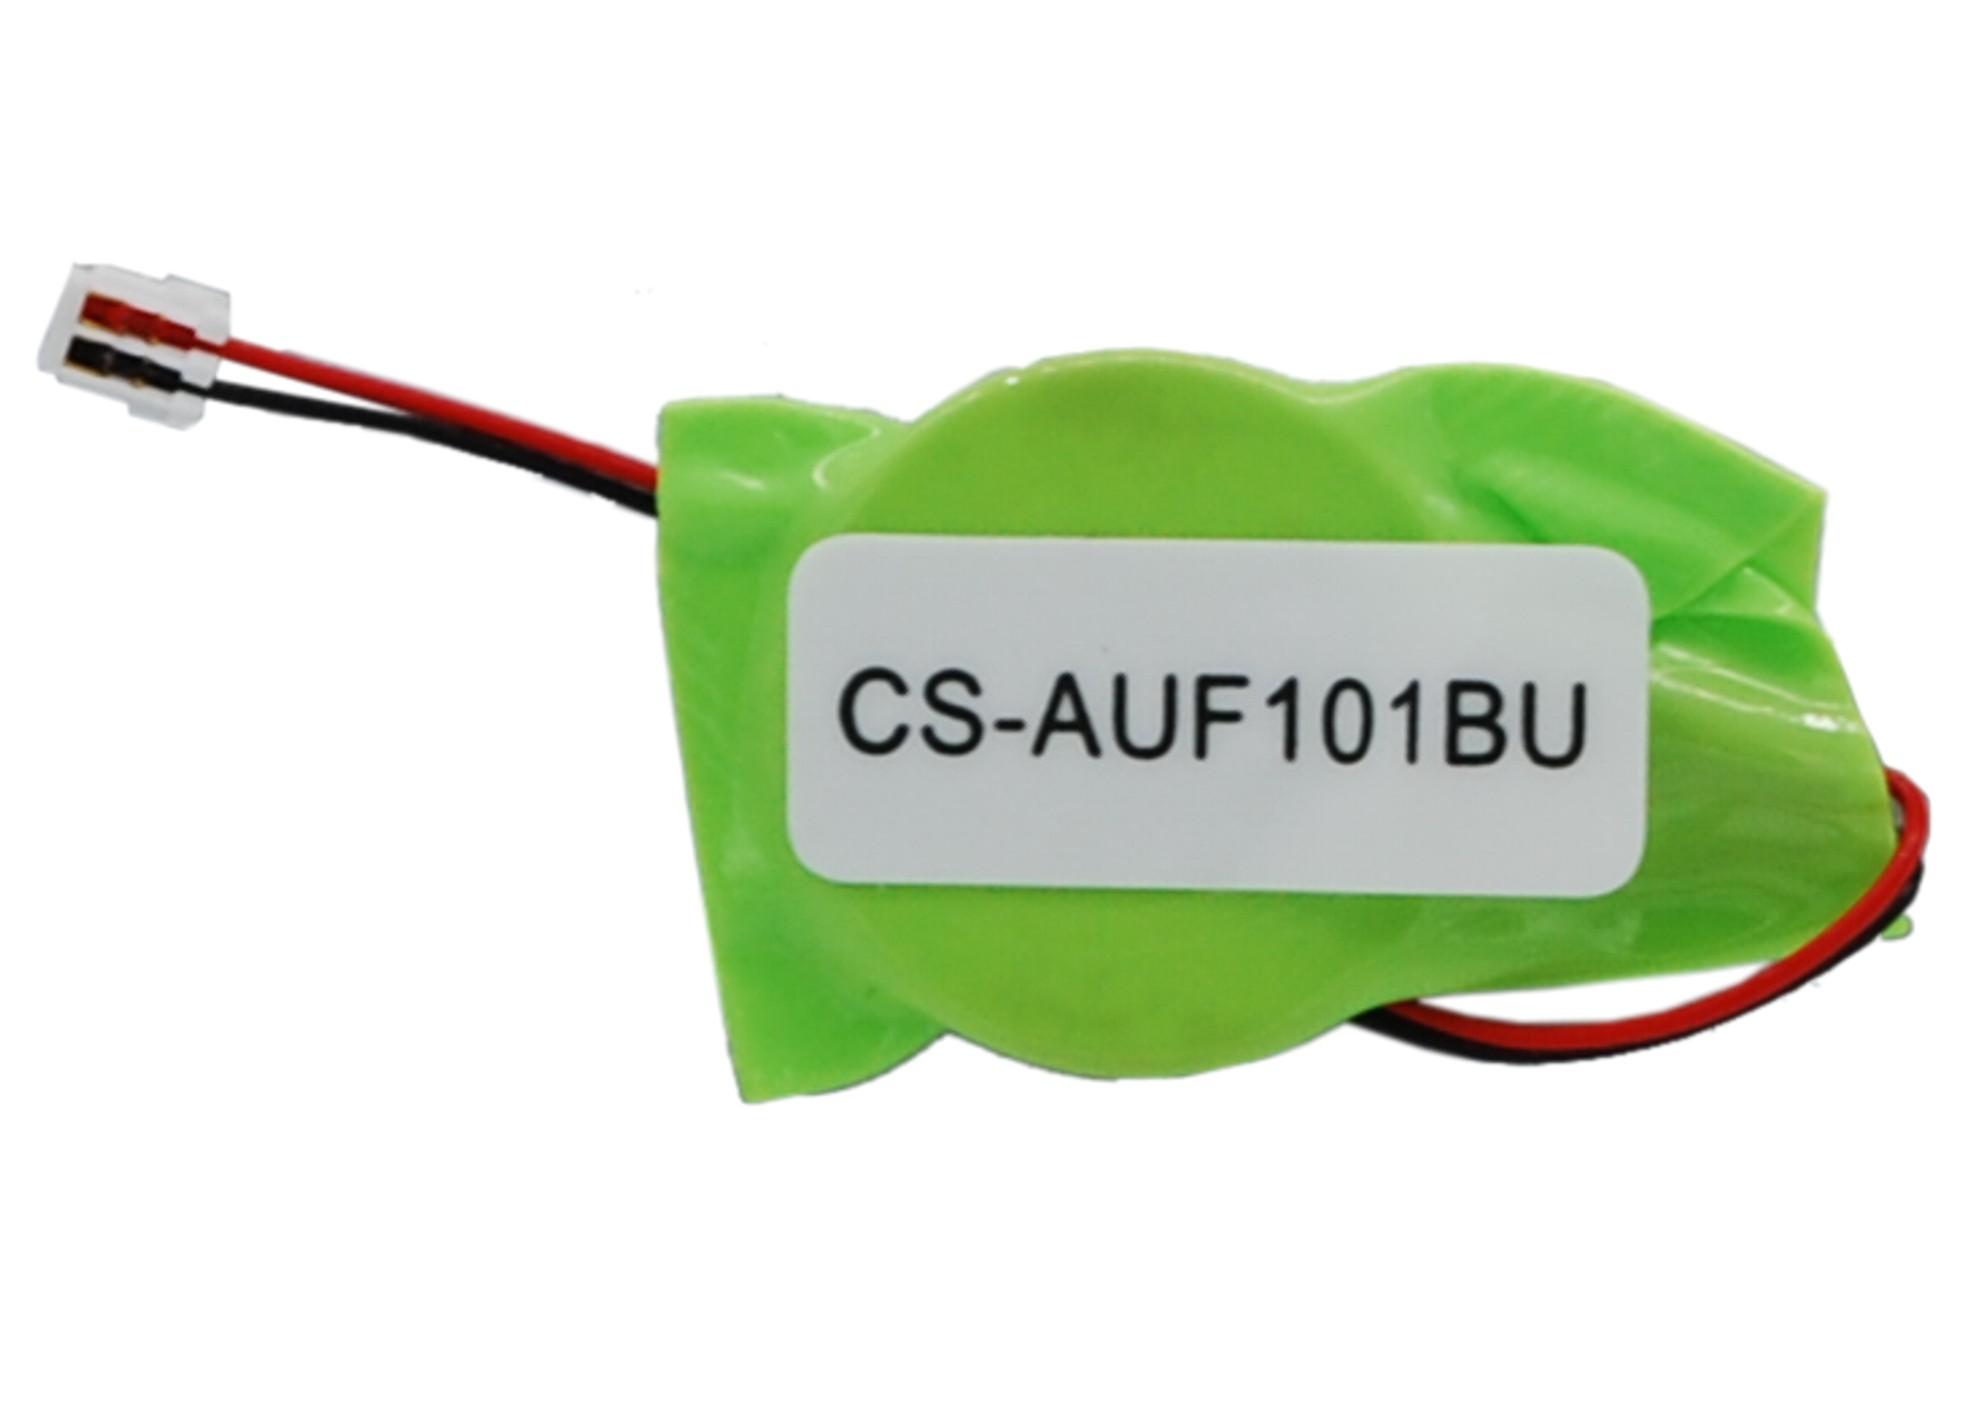 Cameron Sino baterie cmos pro ASUS Eee Pad Transformer TF101-1B046A 3V Li-ion 40mAh zelená - neoriginální